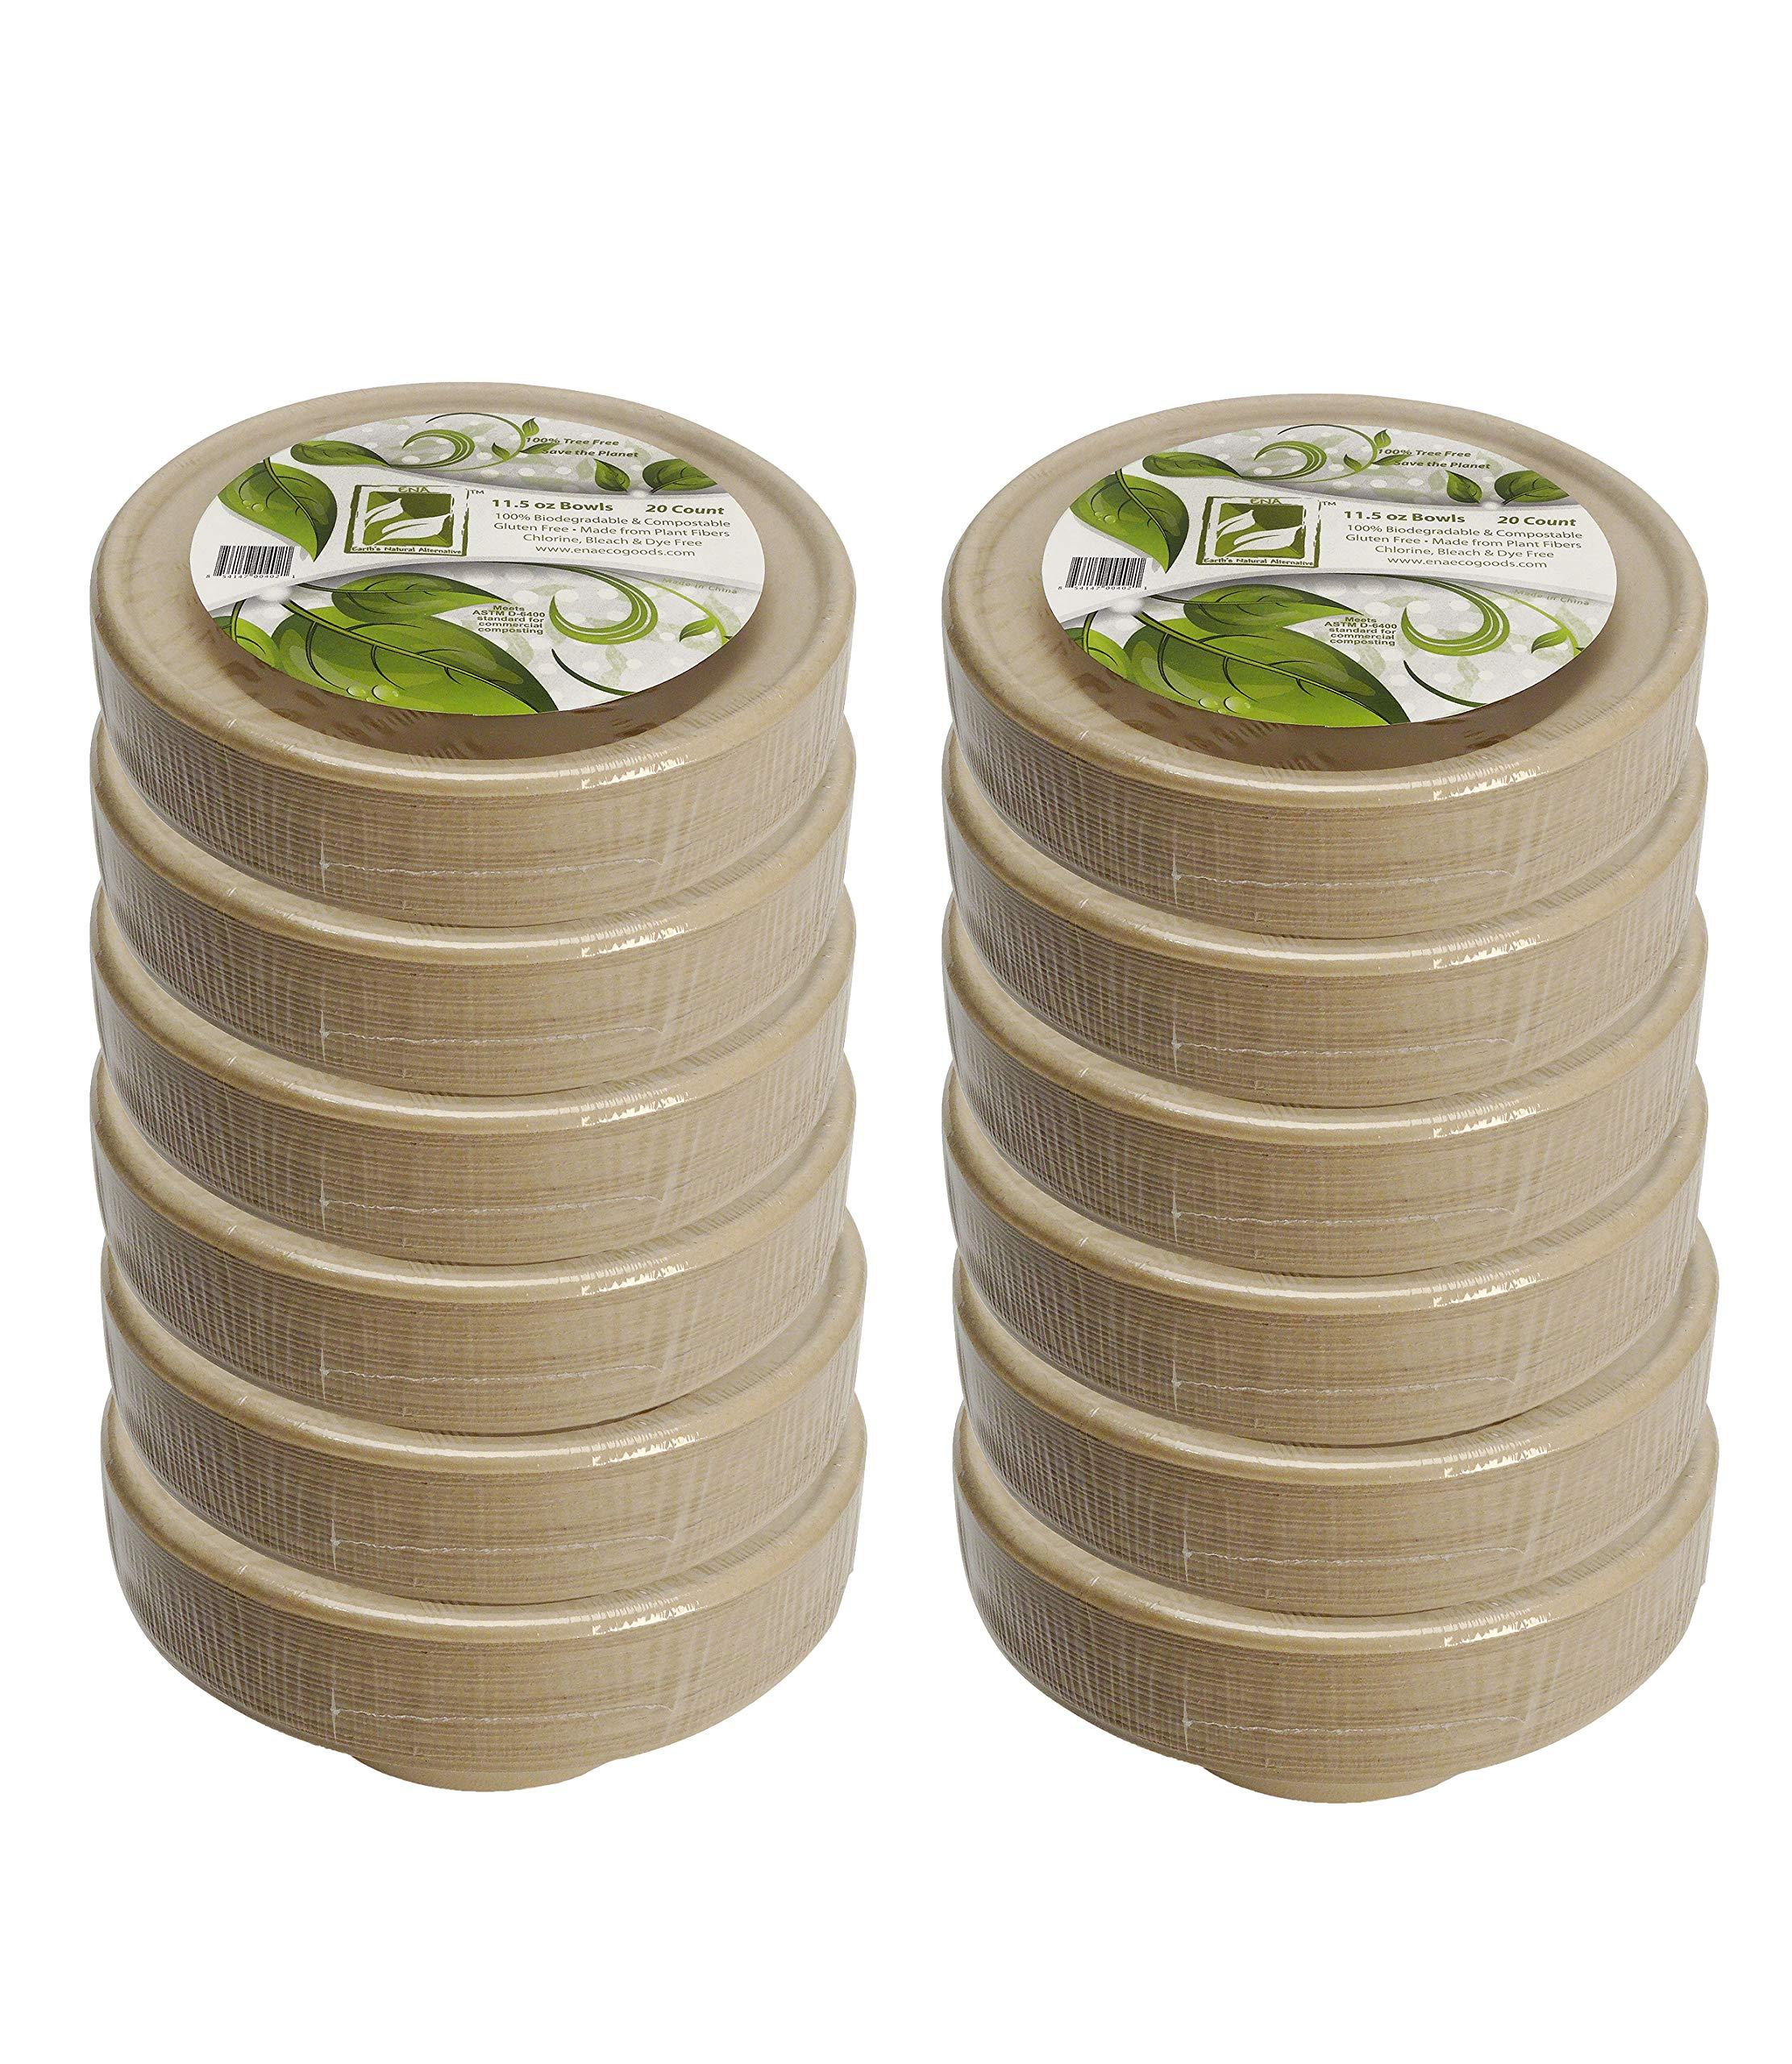 Earth's Natural Alternative Eco-Friendly, Natural Compostable Plant Fiber 12 oz. Bowl, Tan, 240 Count